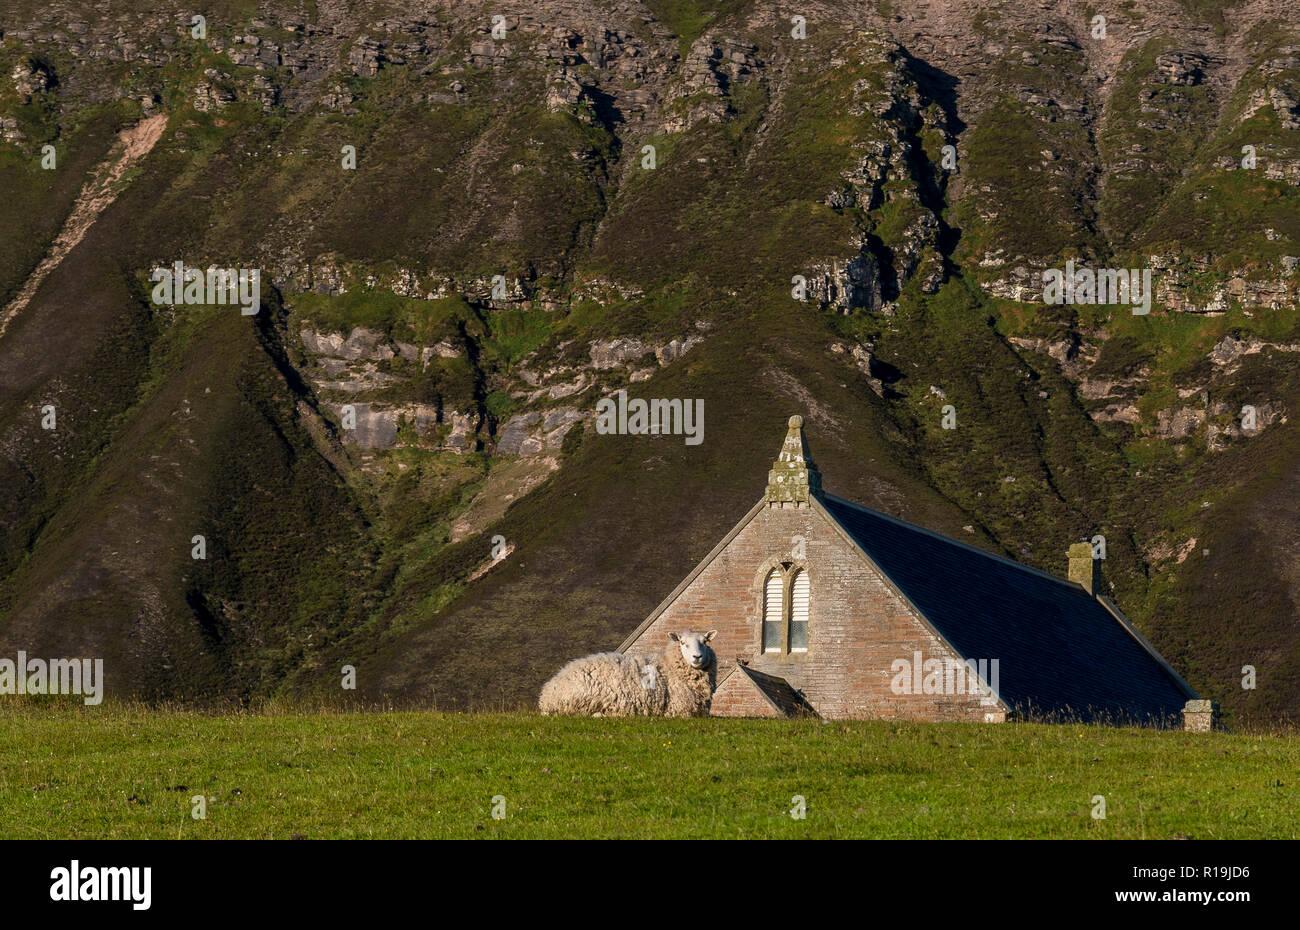 Sheep and Kirk, Church Gable end, Ward Hill, Hoy - Stock Image